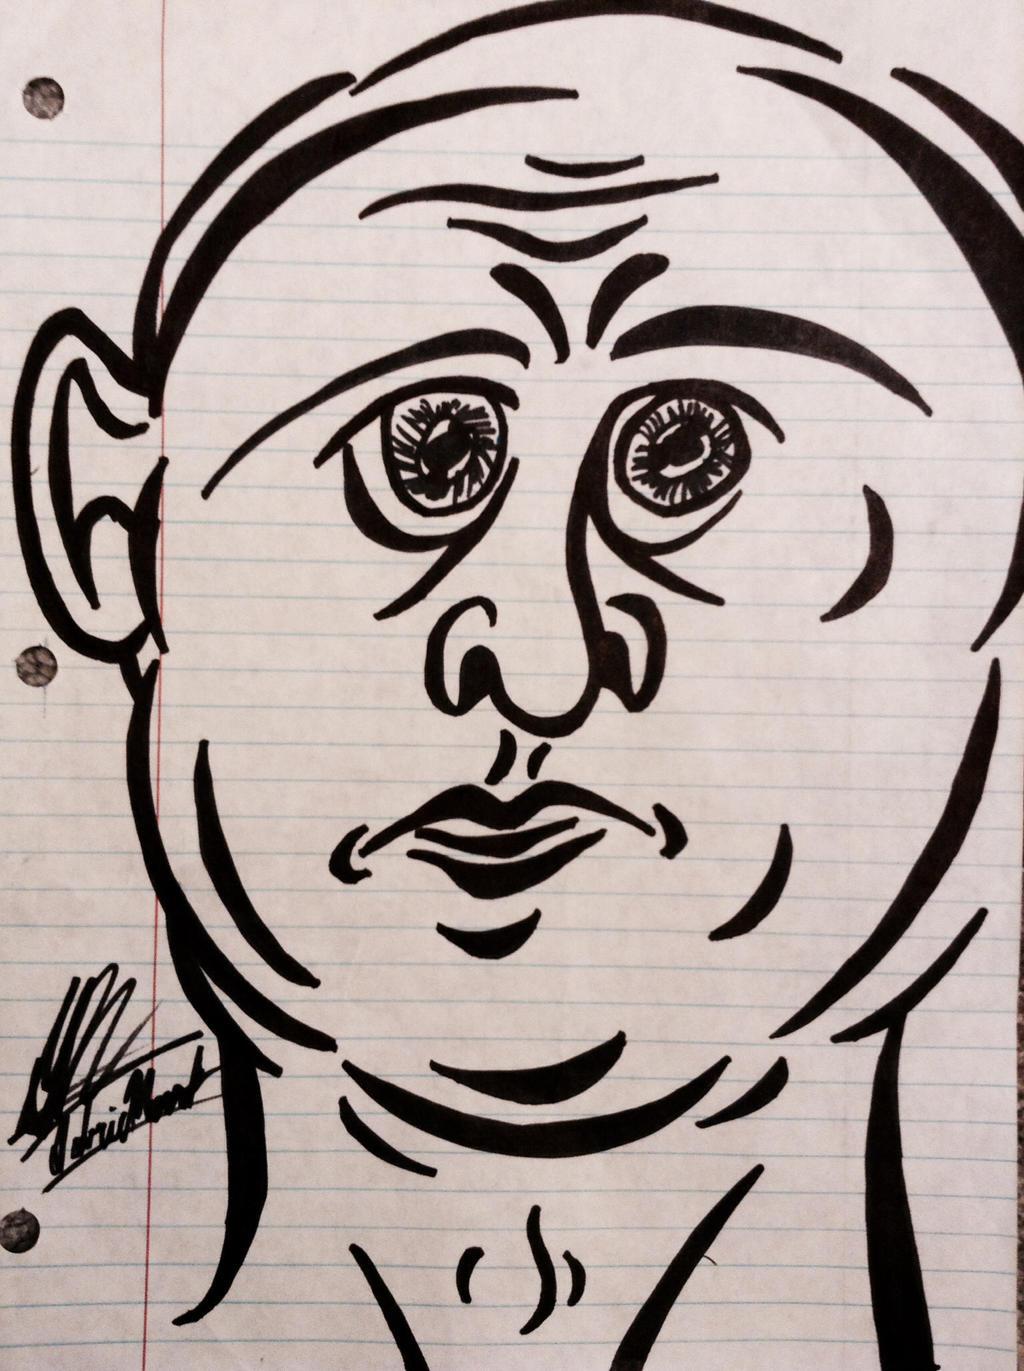 Crazy Face: Blanc by GabrielNovakStudios on deviantART